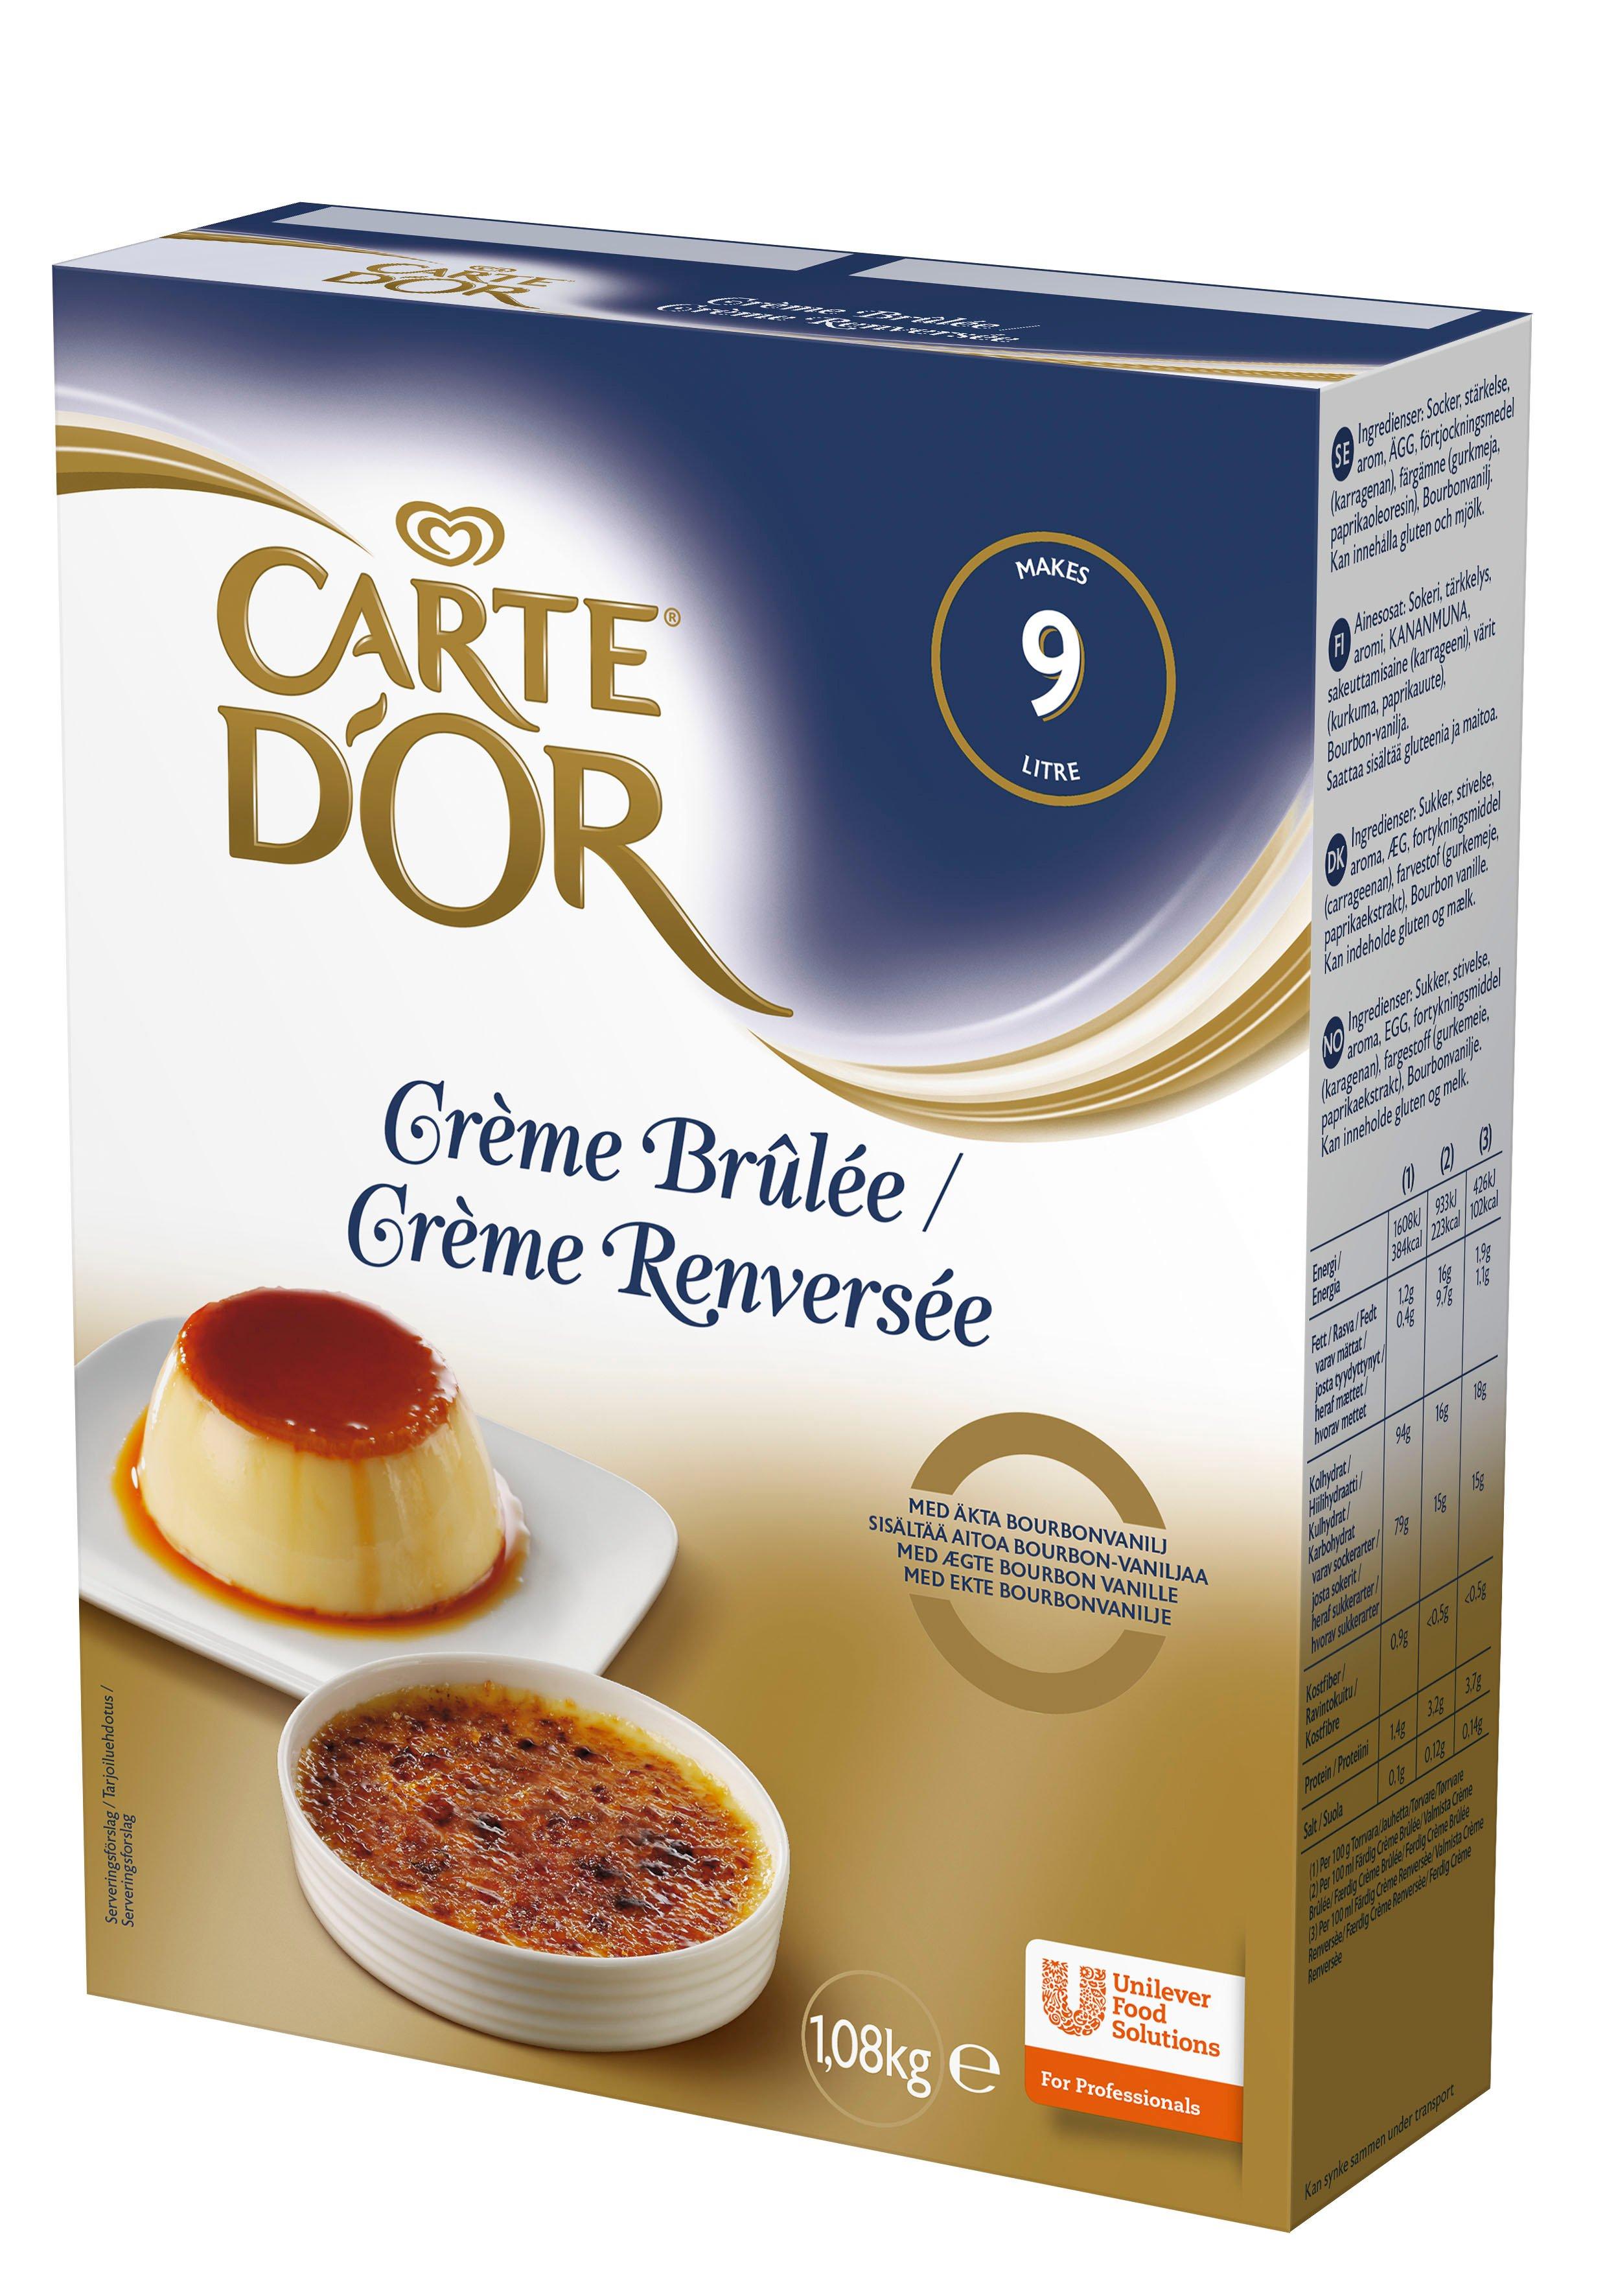 Carte d'Or Creme Brulee/ Creme Renversee